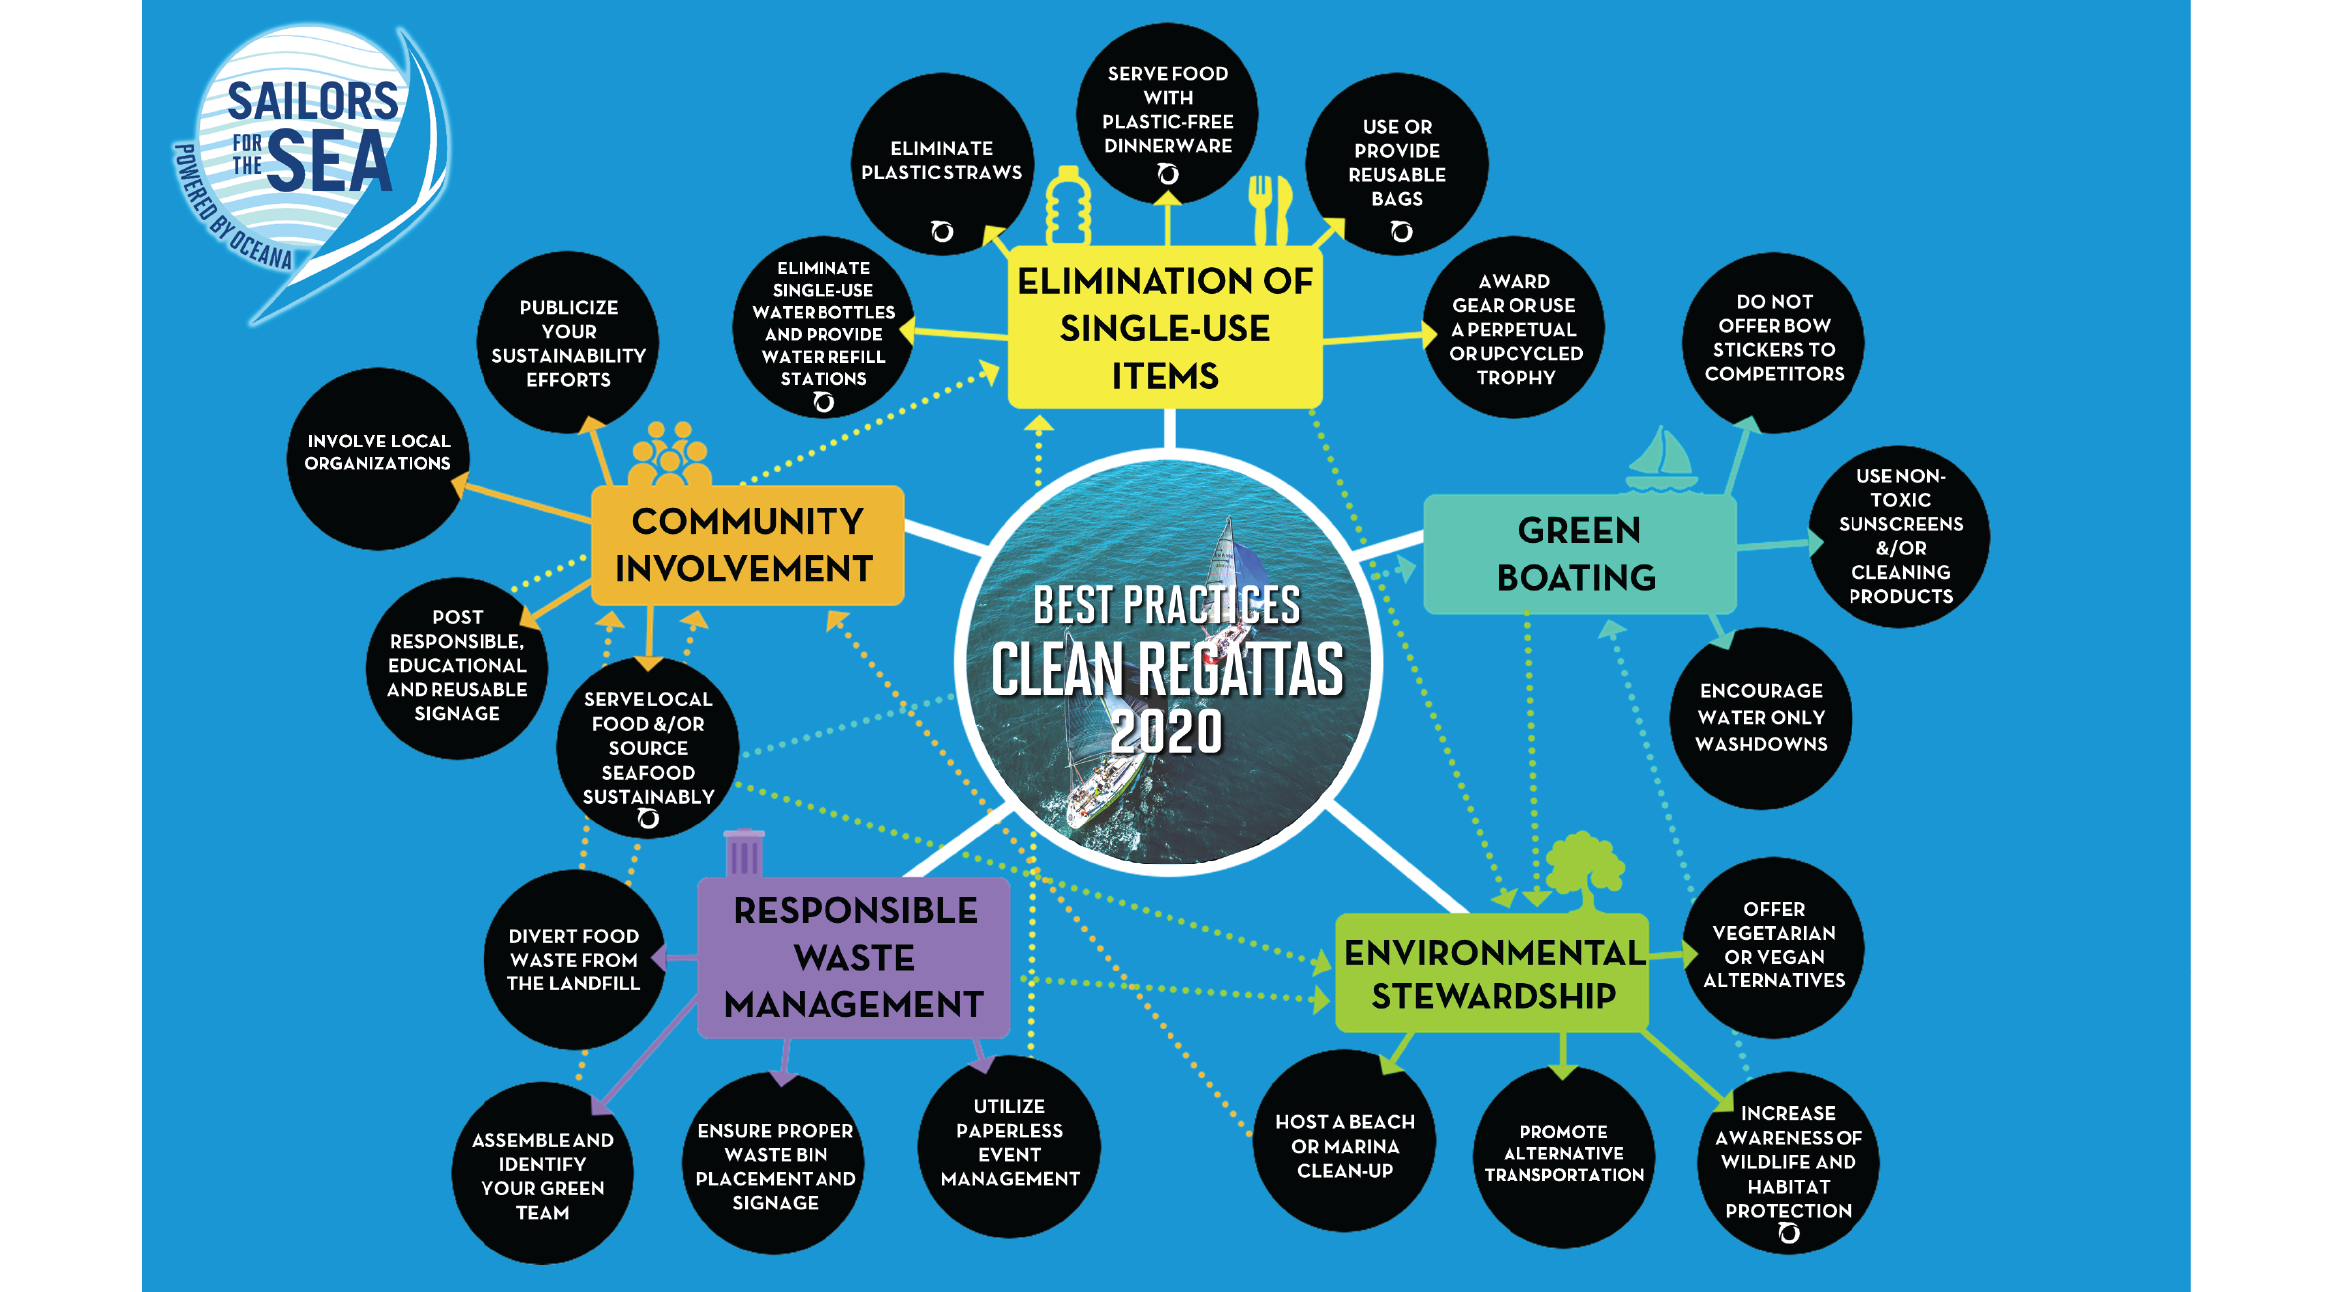 sustainability, certification, regattas, sailing, events, best practices, web